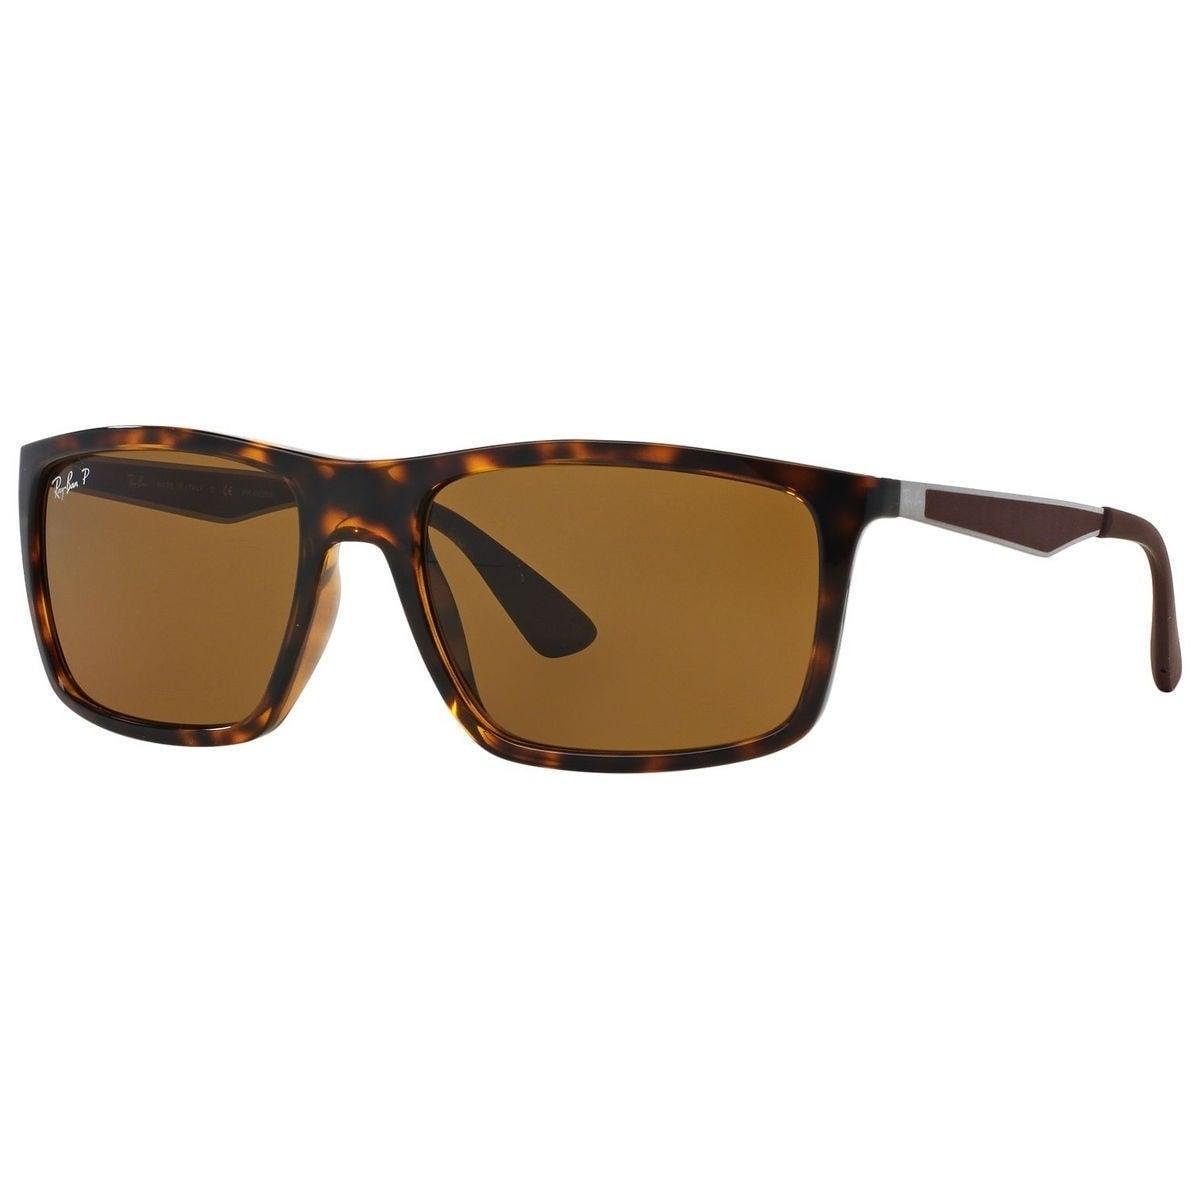 dda88bc81c Shop Ray-Ban RB4228 710 83 Men s Tortoise Gunmetal Frame Polarized Brown  58mm Lens Sunglasses - Ships To Canada - Overstock - 15297180